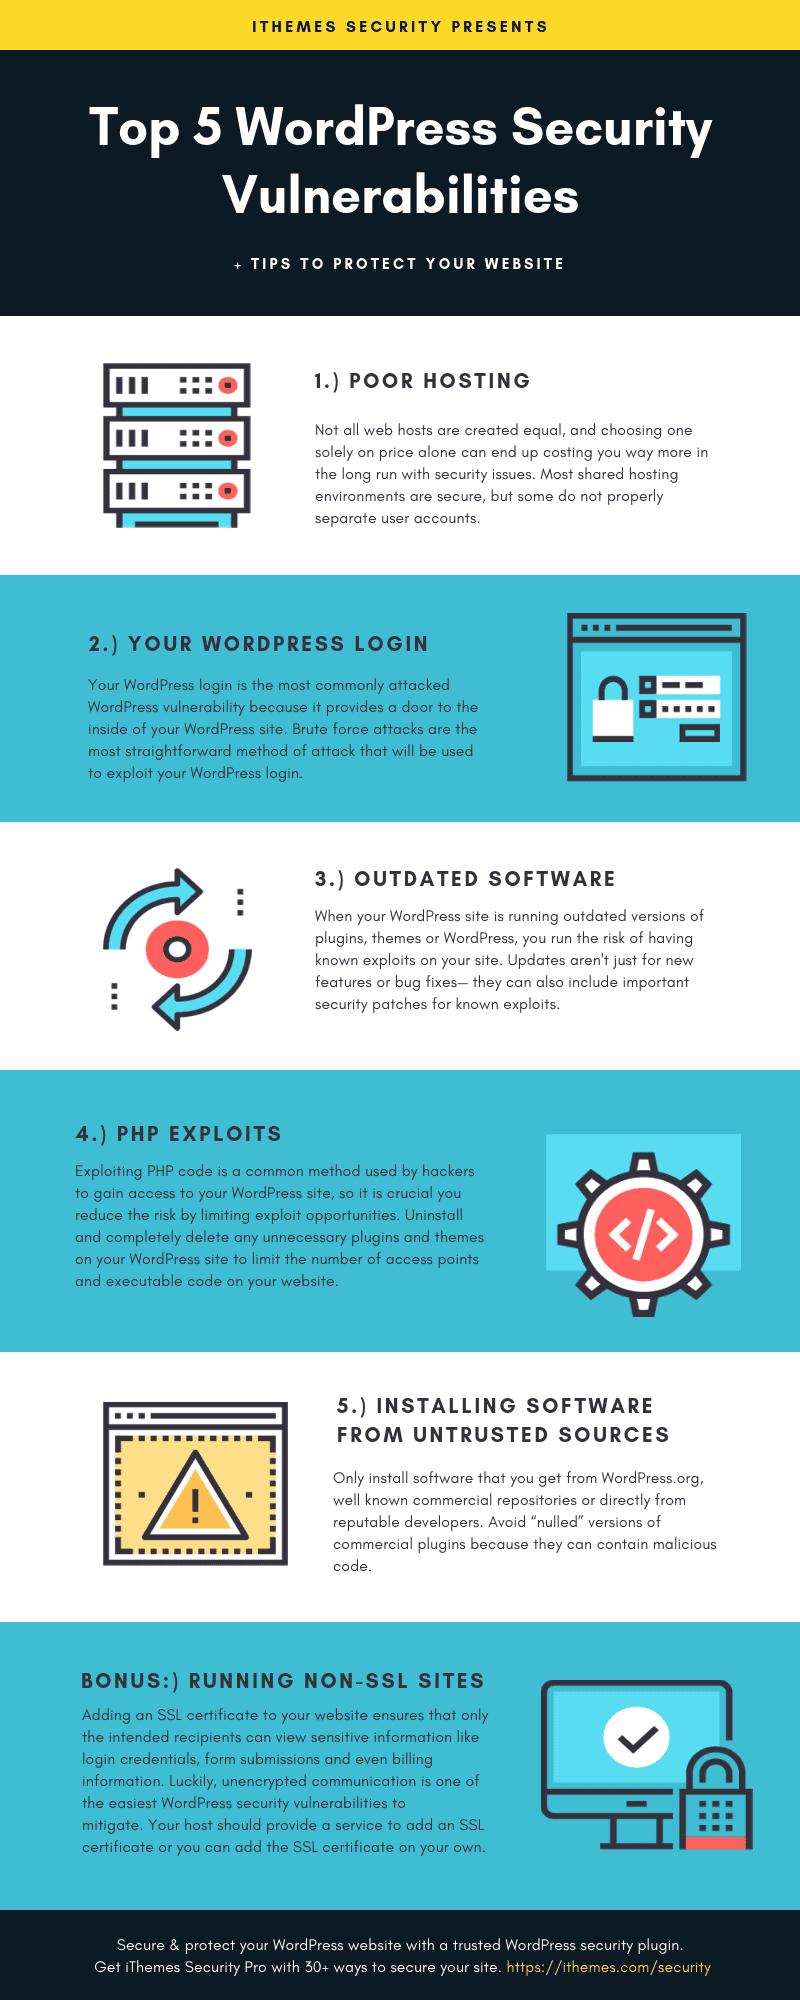 Top 5 WordPress Security Vulnerabilities - iThemes Security